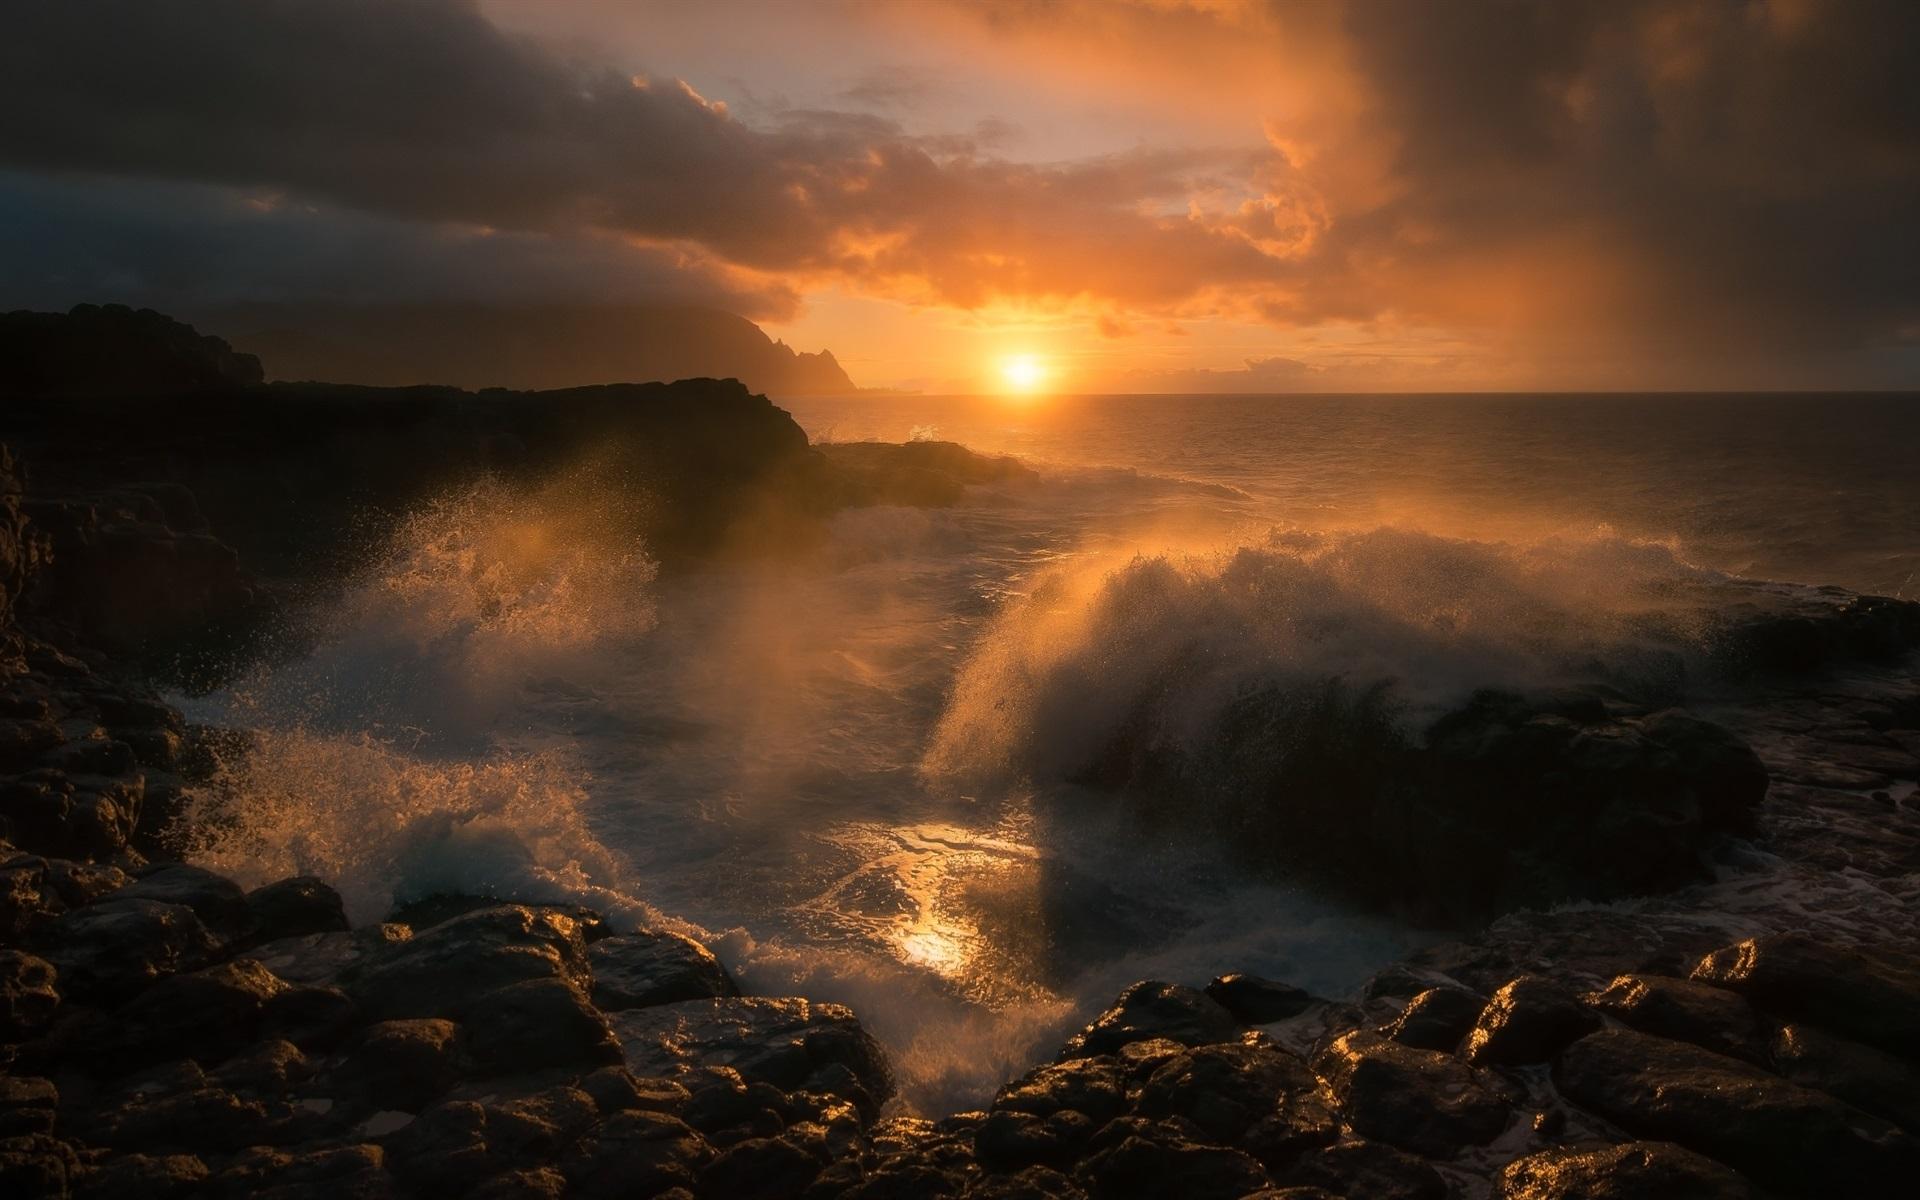 шторм солнце картинки где